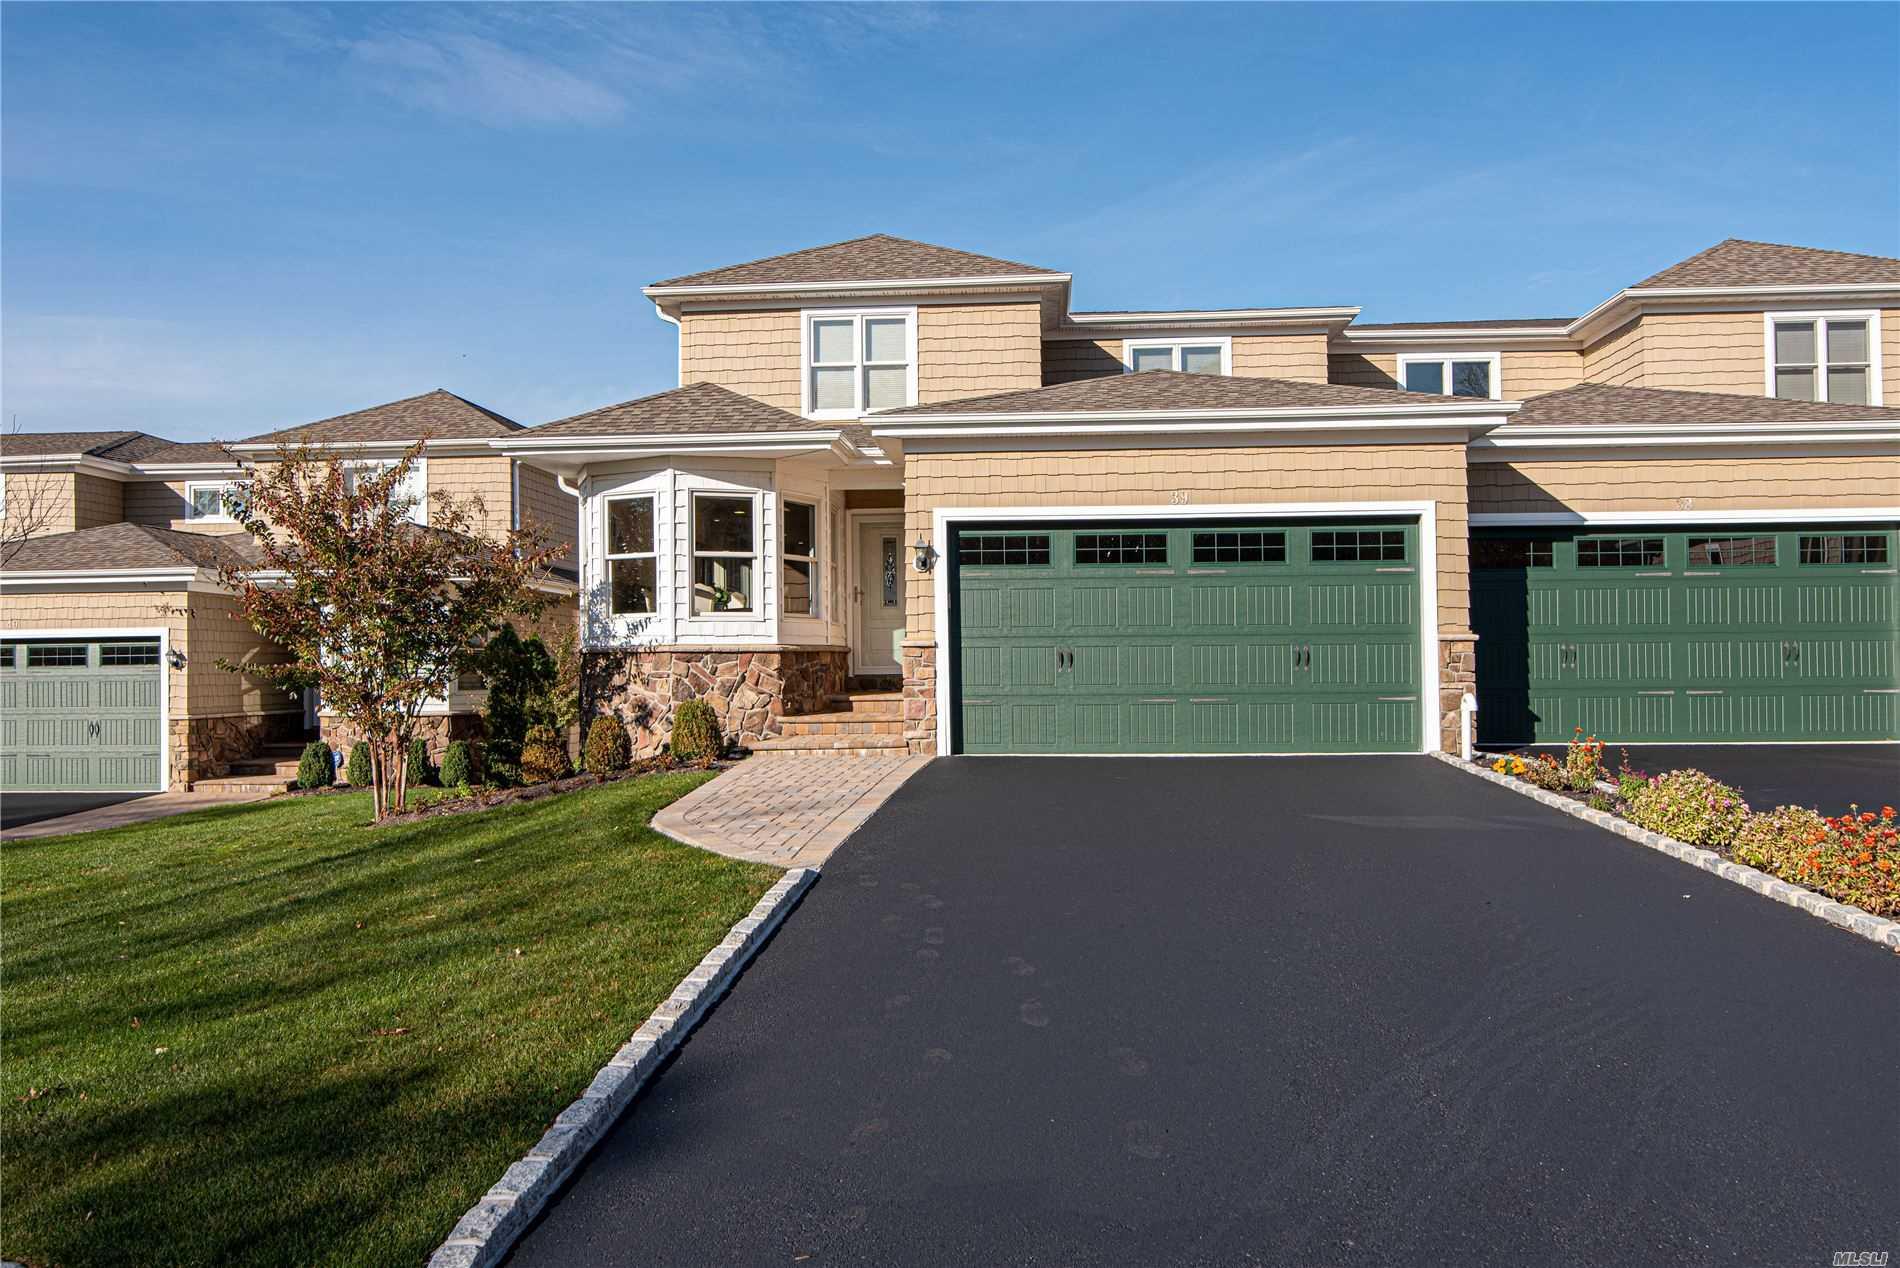 Property for sale at 39 Kewpie Circle, Port Jefferson NY 11777, Port Jefferson,  New York 11777